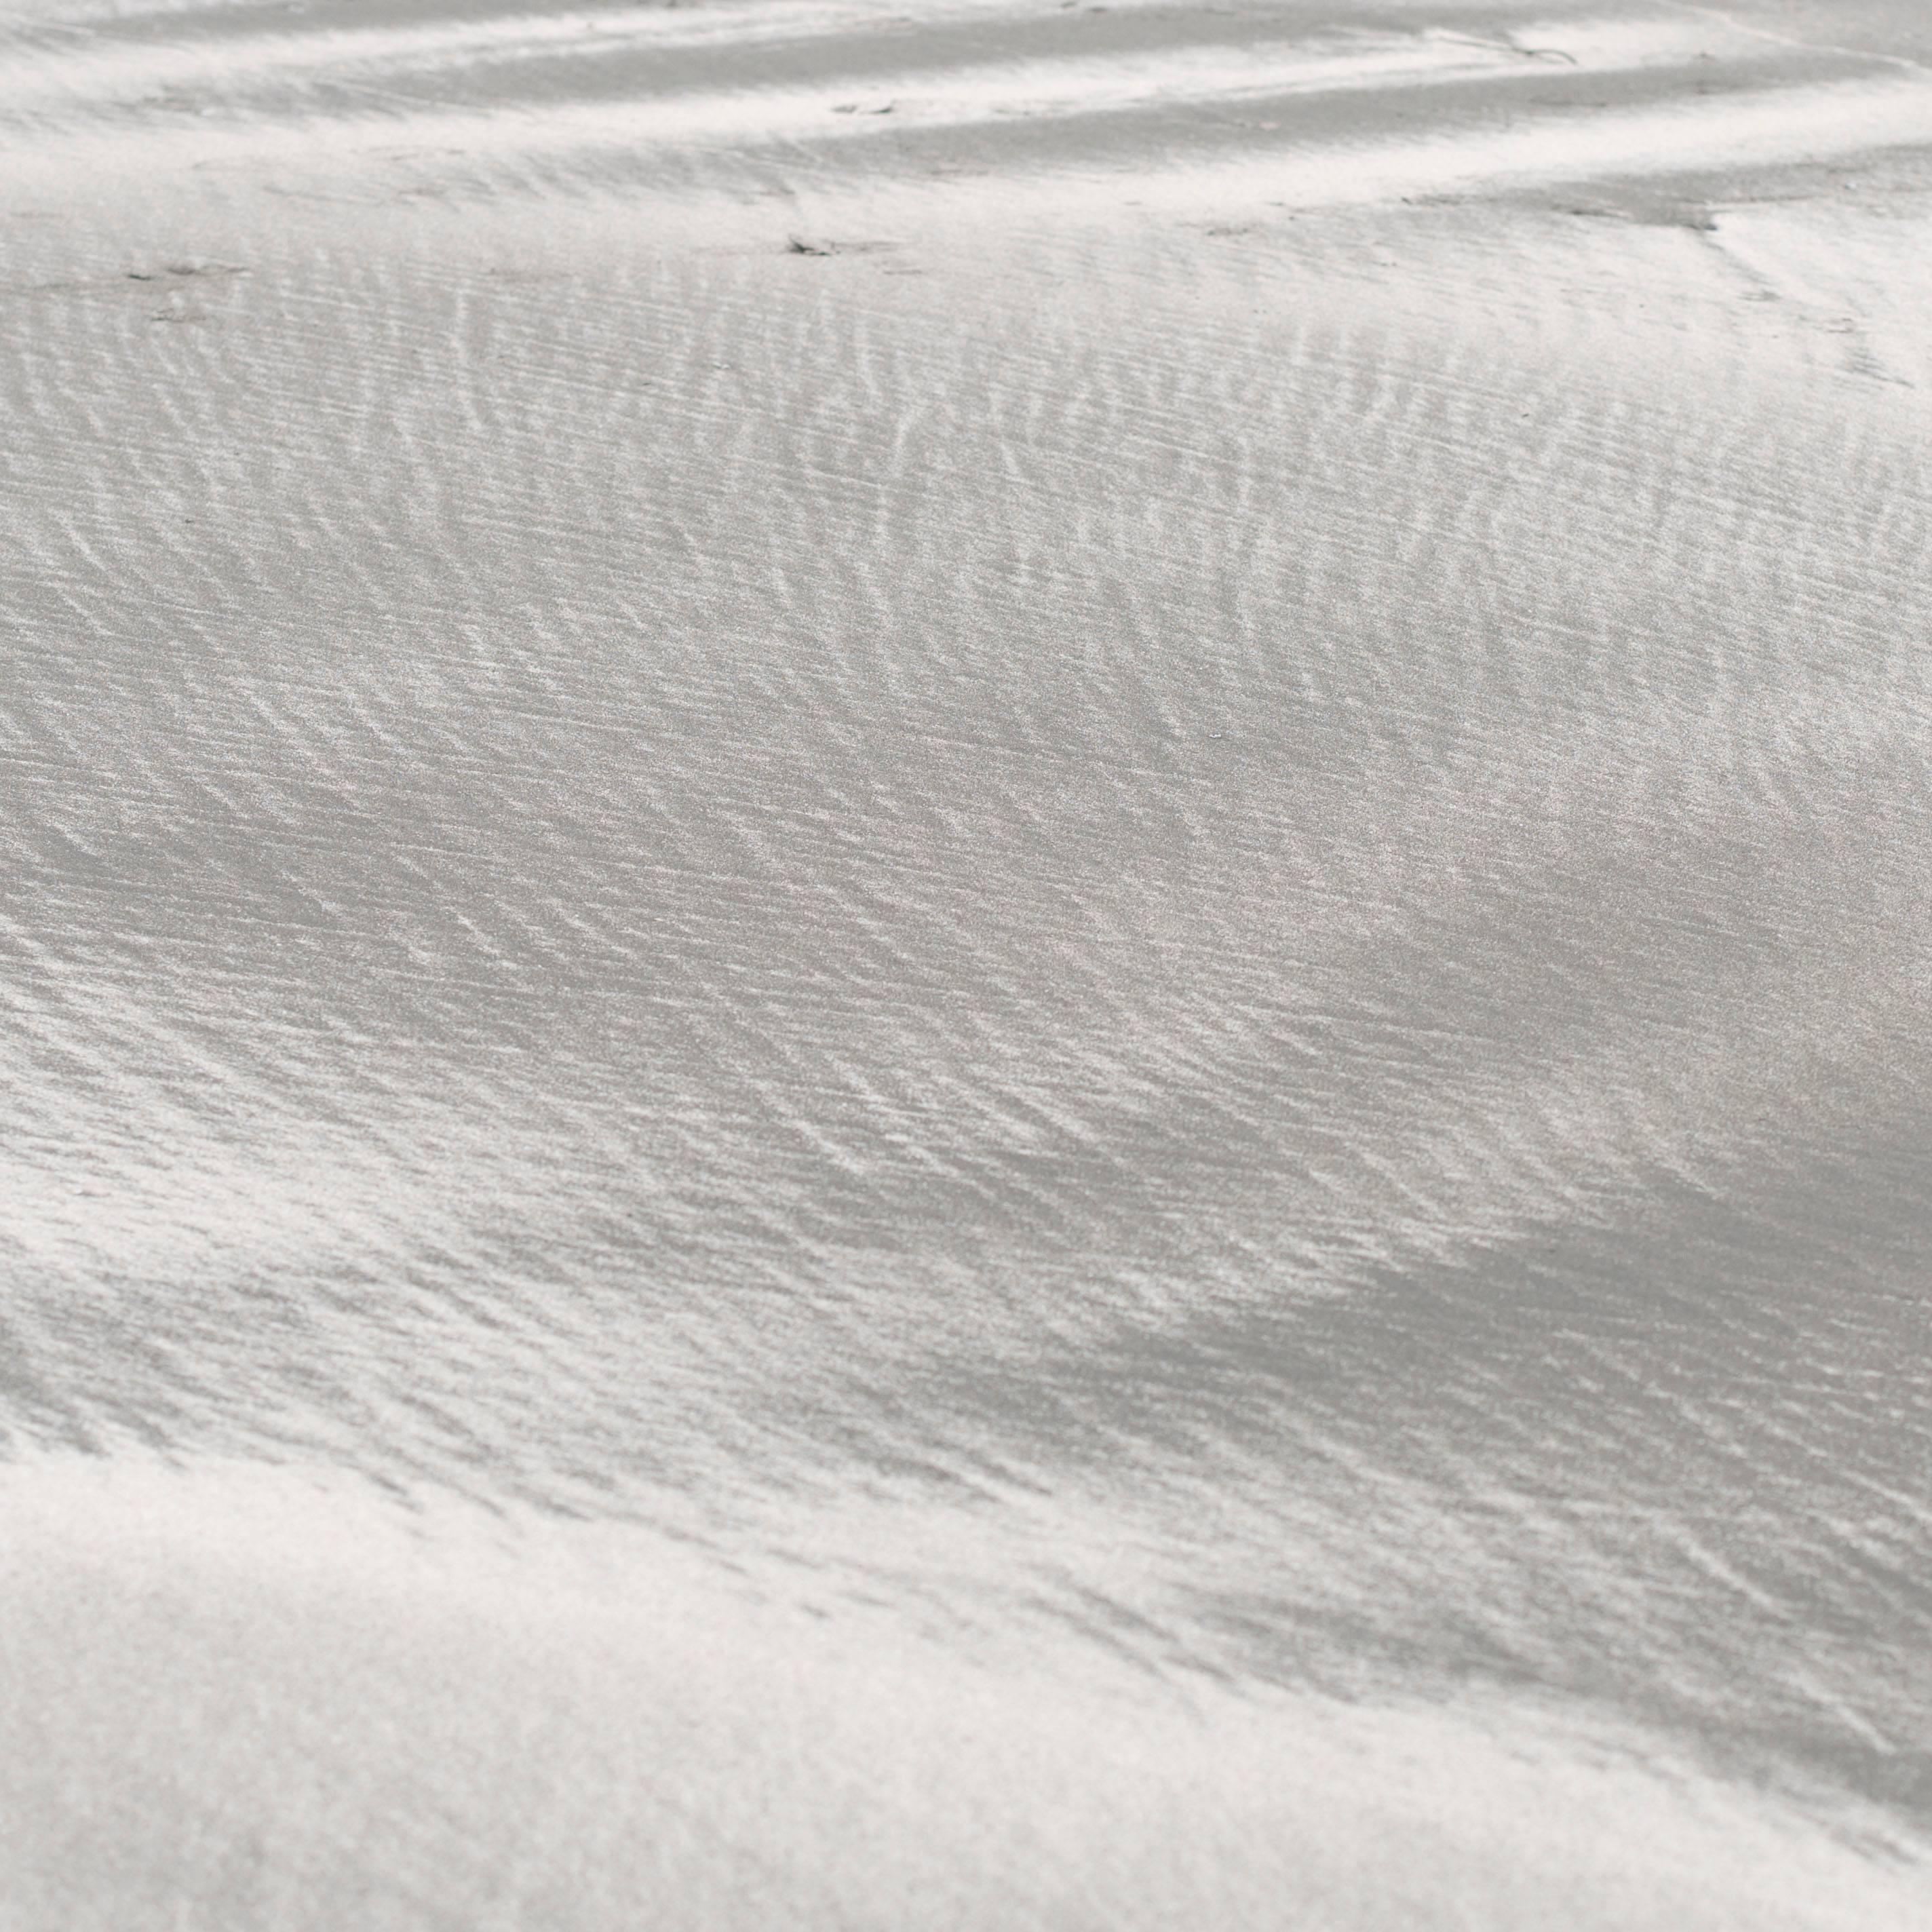 """Texture 10: Shell Dust"", Mendocino, CA Photograph, 2015"